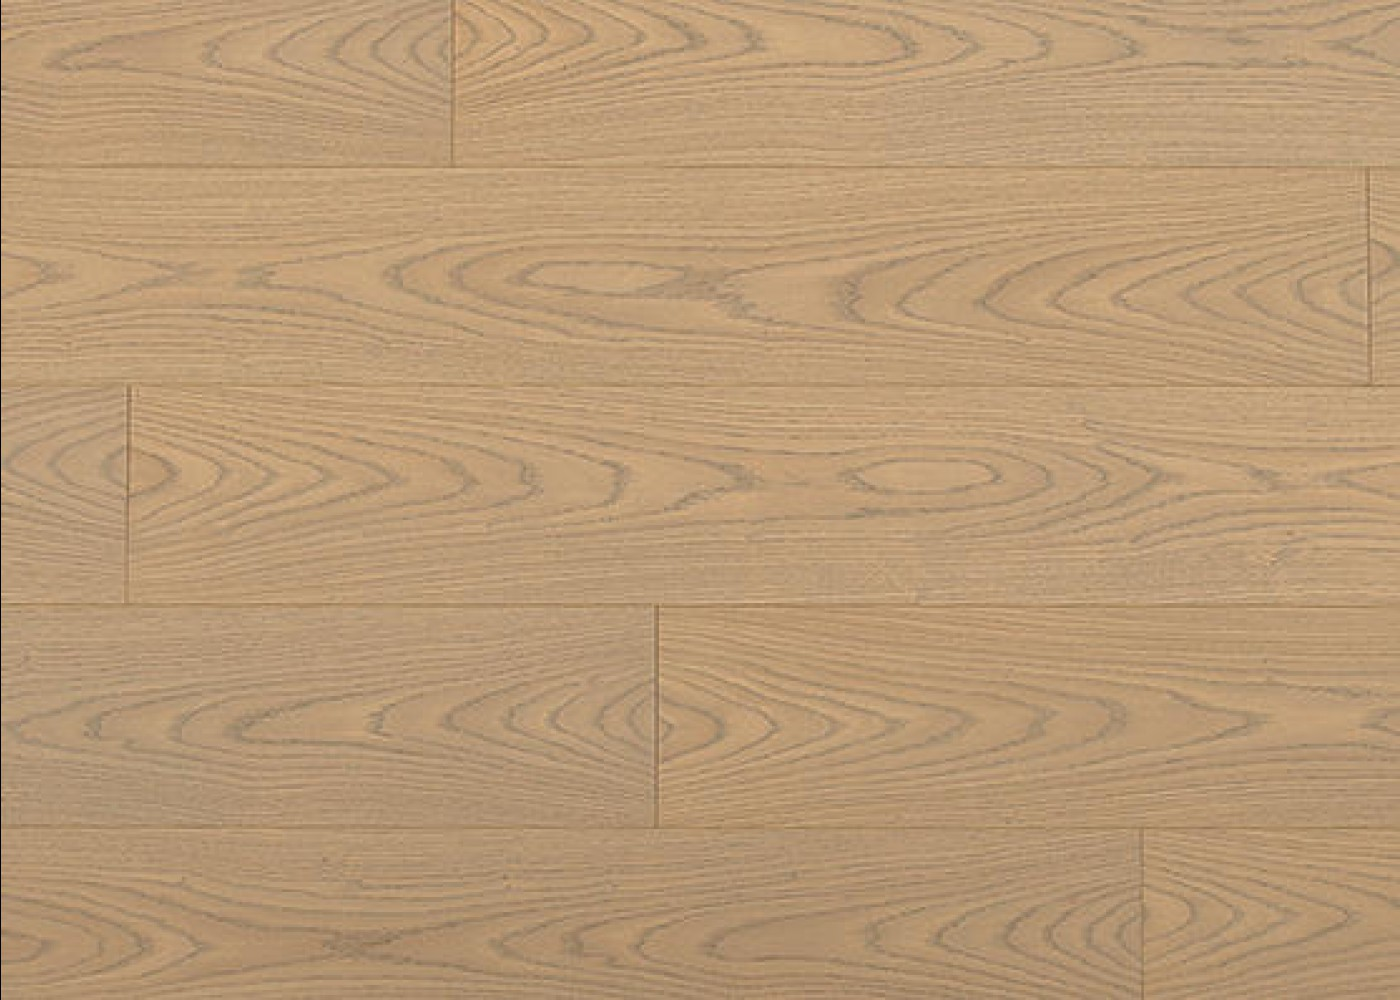 Sol plaqué bois Chêne SAINT-MALO brossé vernis extra-mat - Summit - Select 10x233x2050